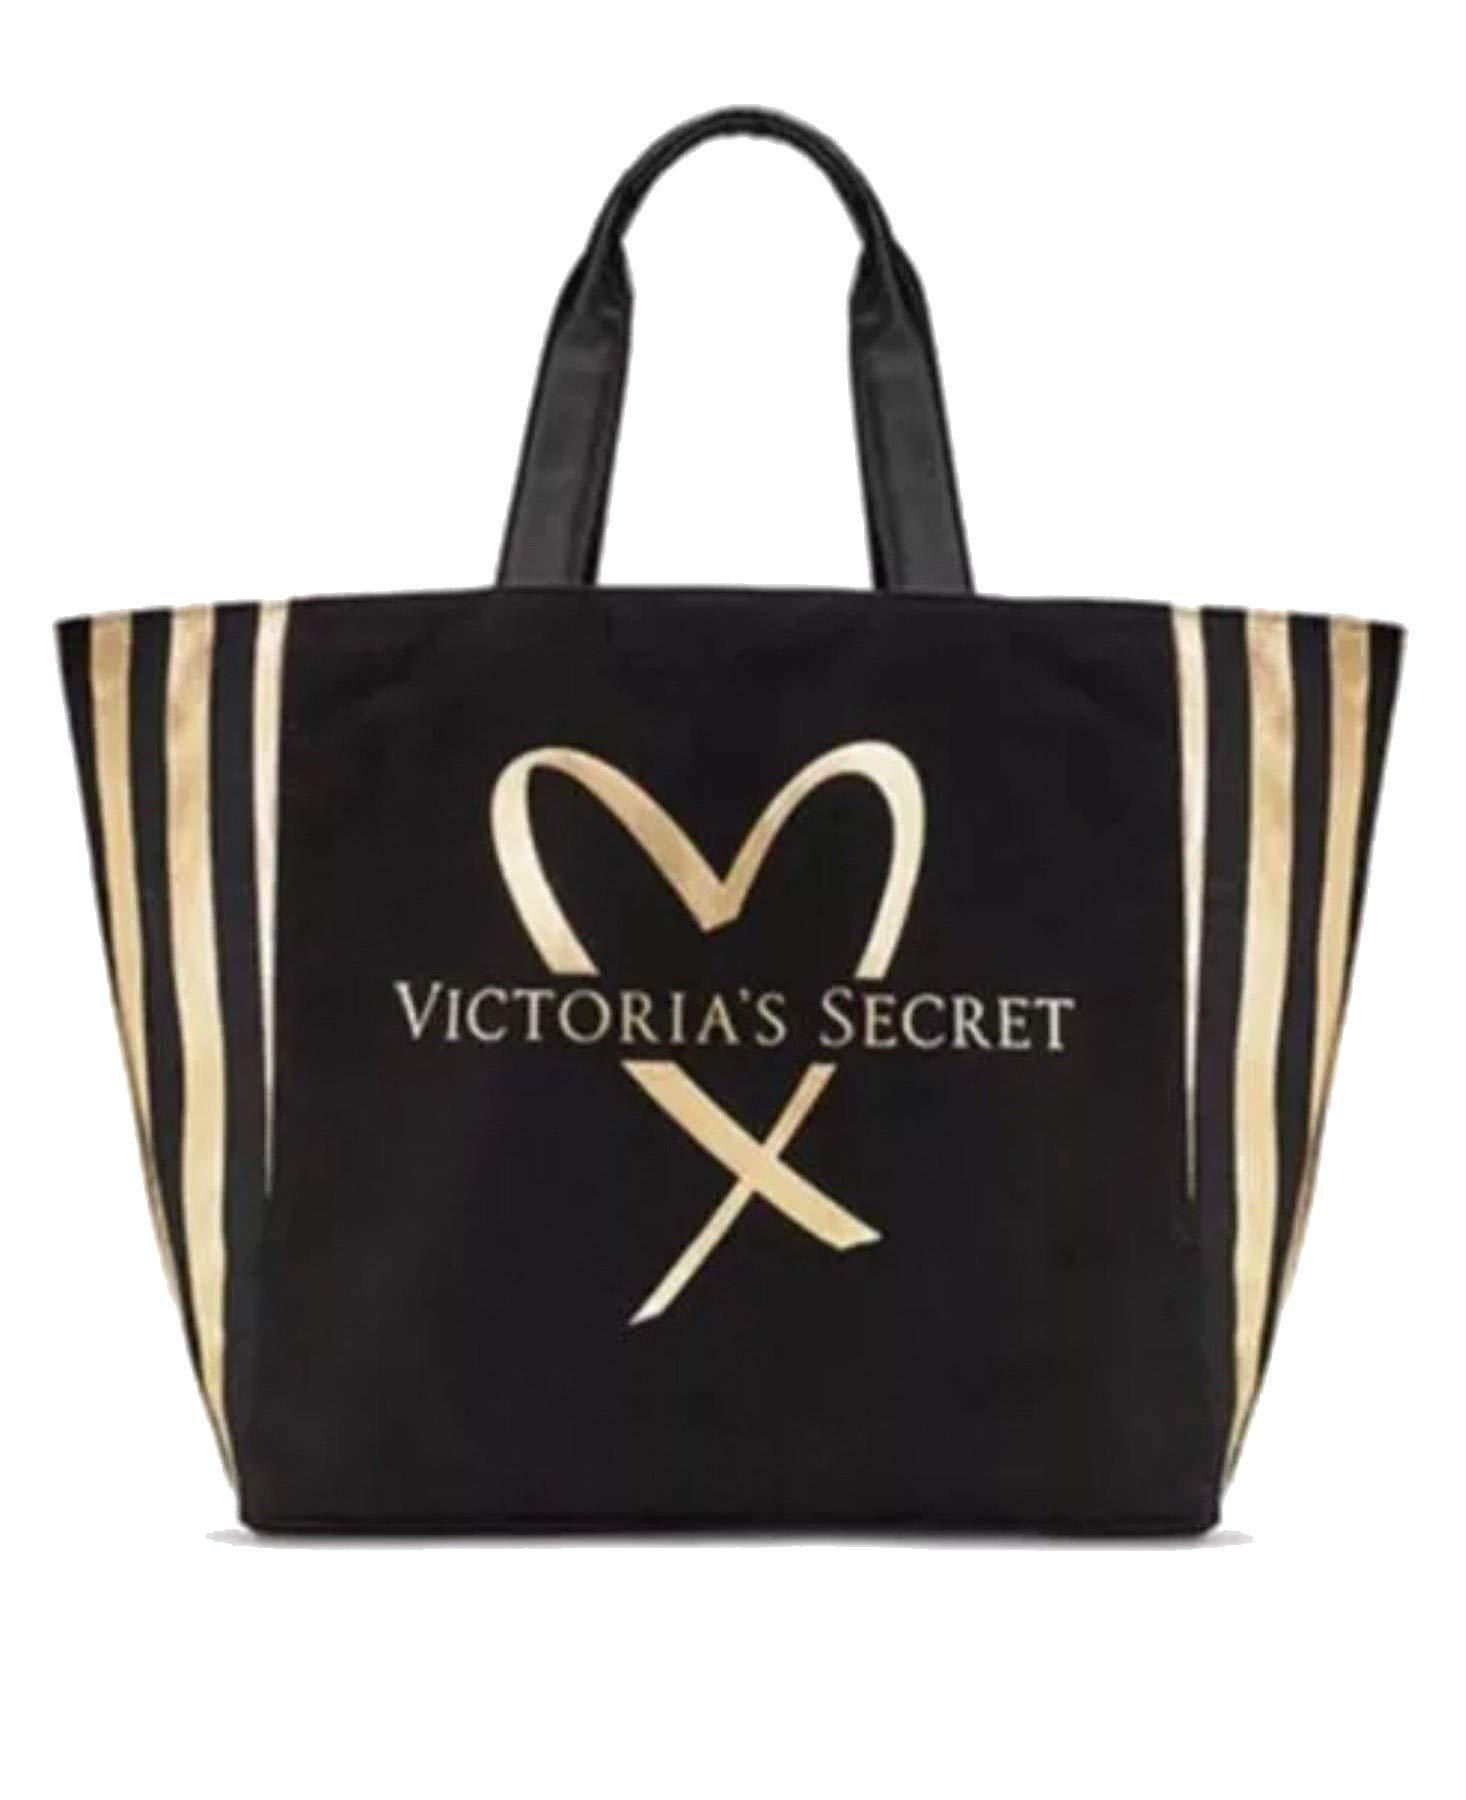 Victoria's Secret Love Tote Bag Black/Gold Stripe